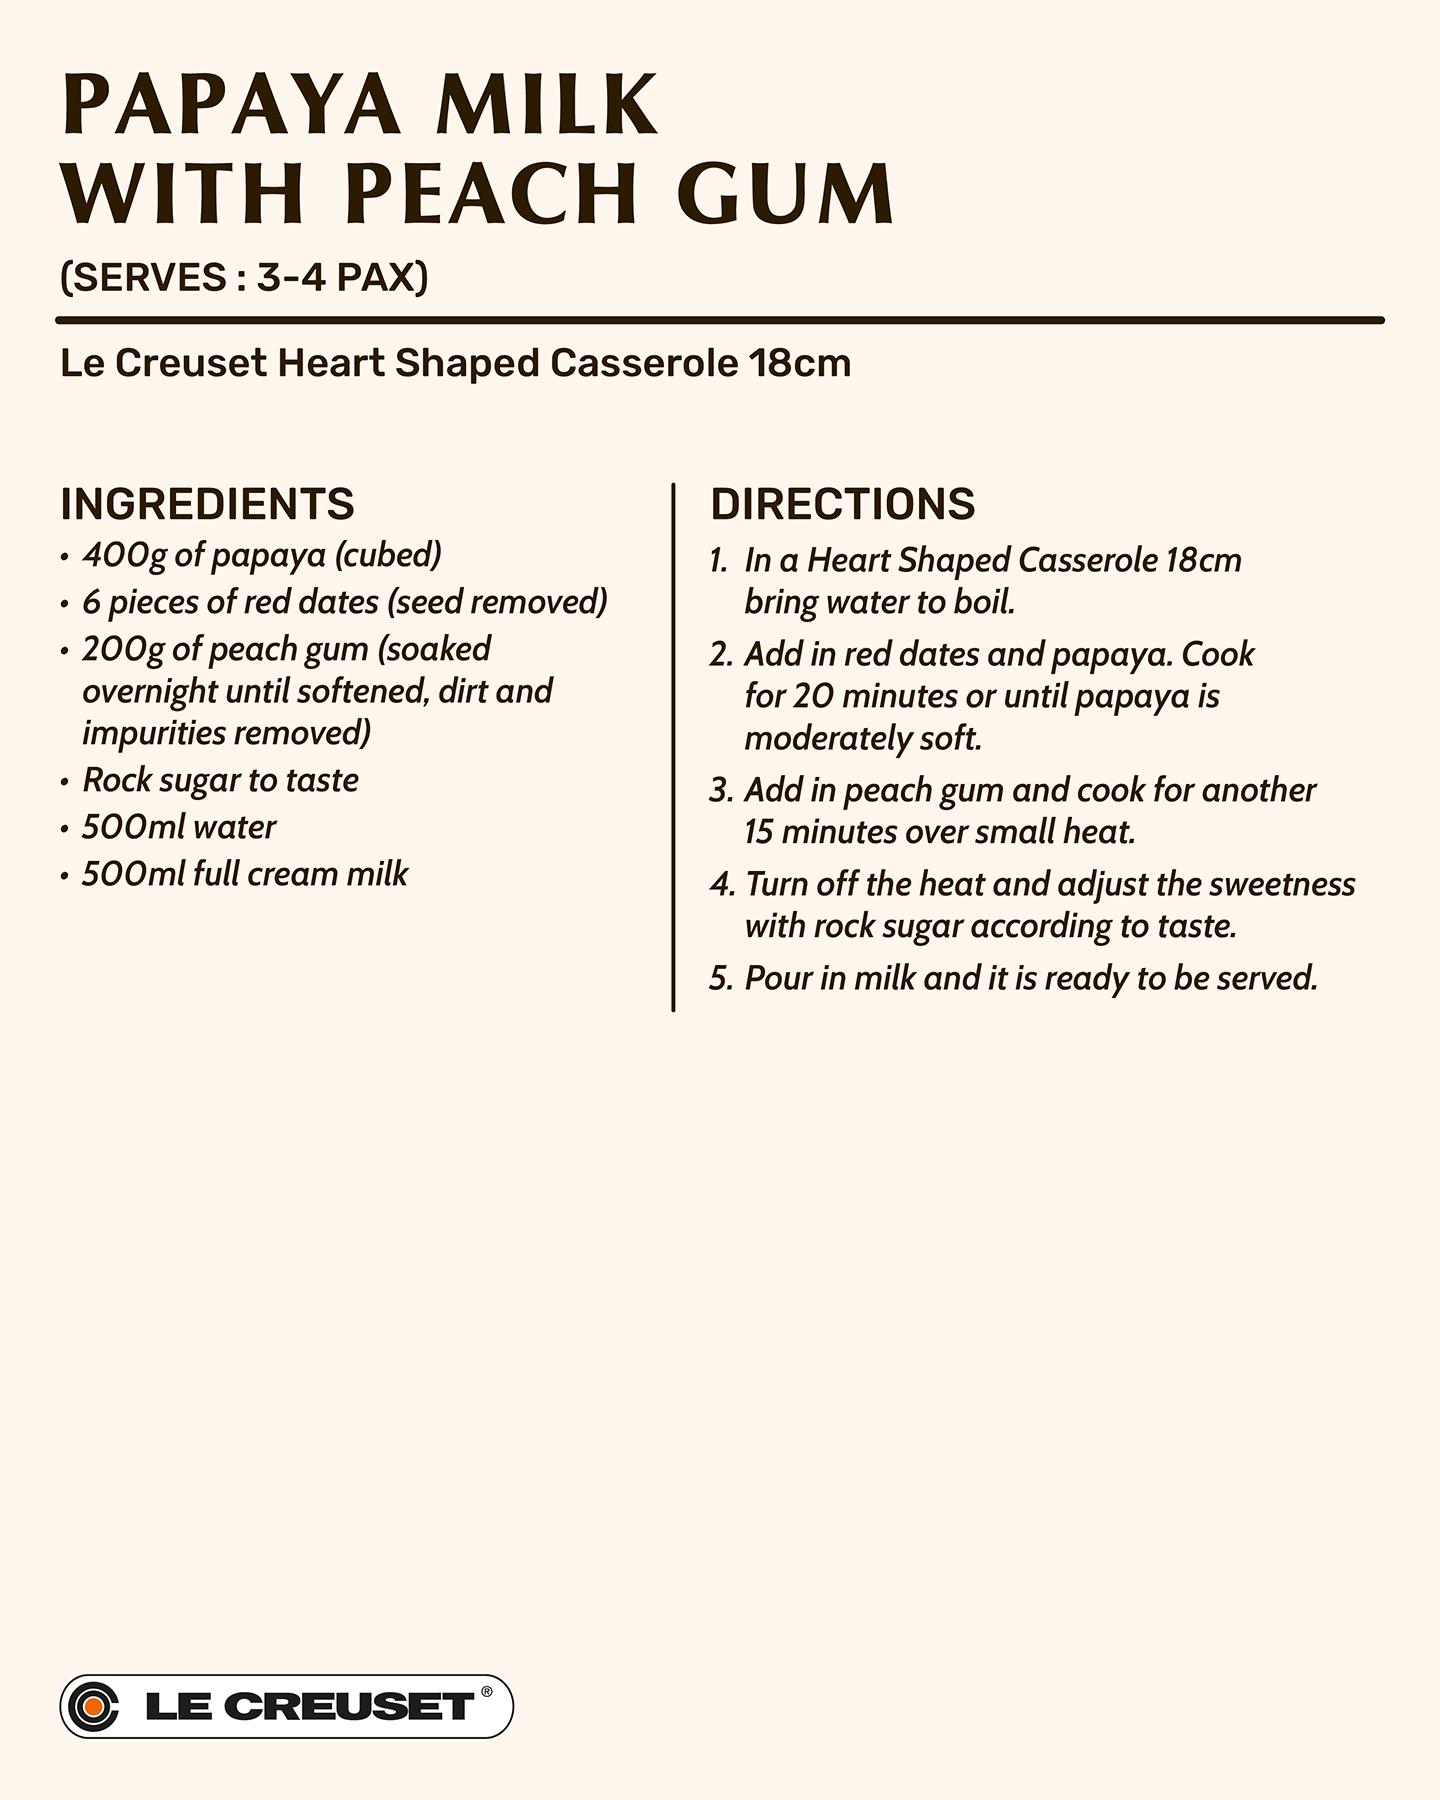 Papaya Milk with Peach Gum